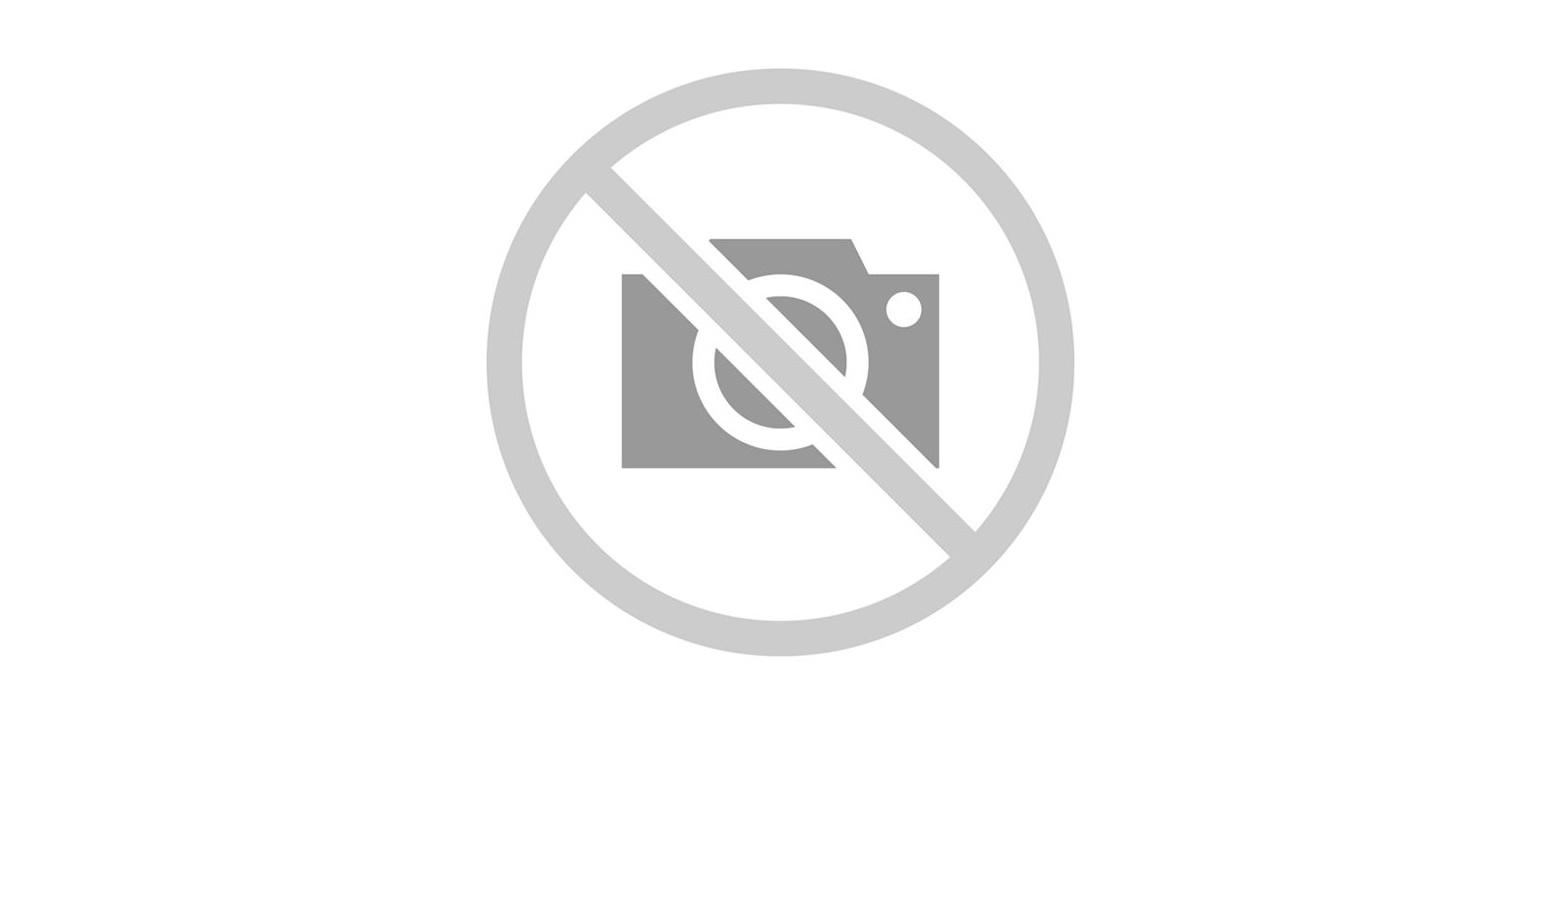 BASLIK+AYAKUCU HIPERIA PLUS 180x200 GRI (M0018)